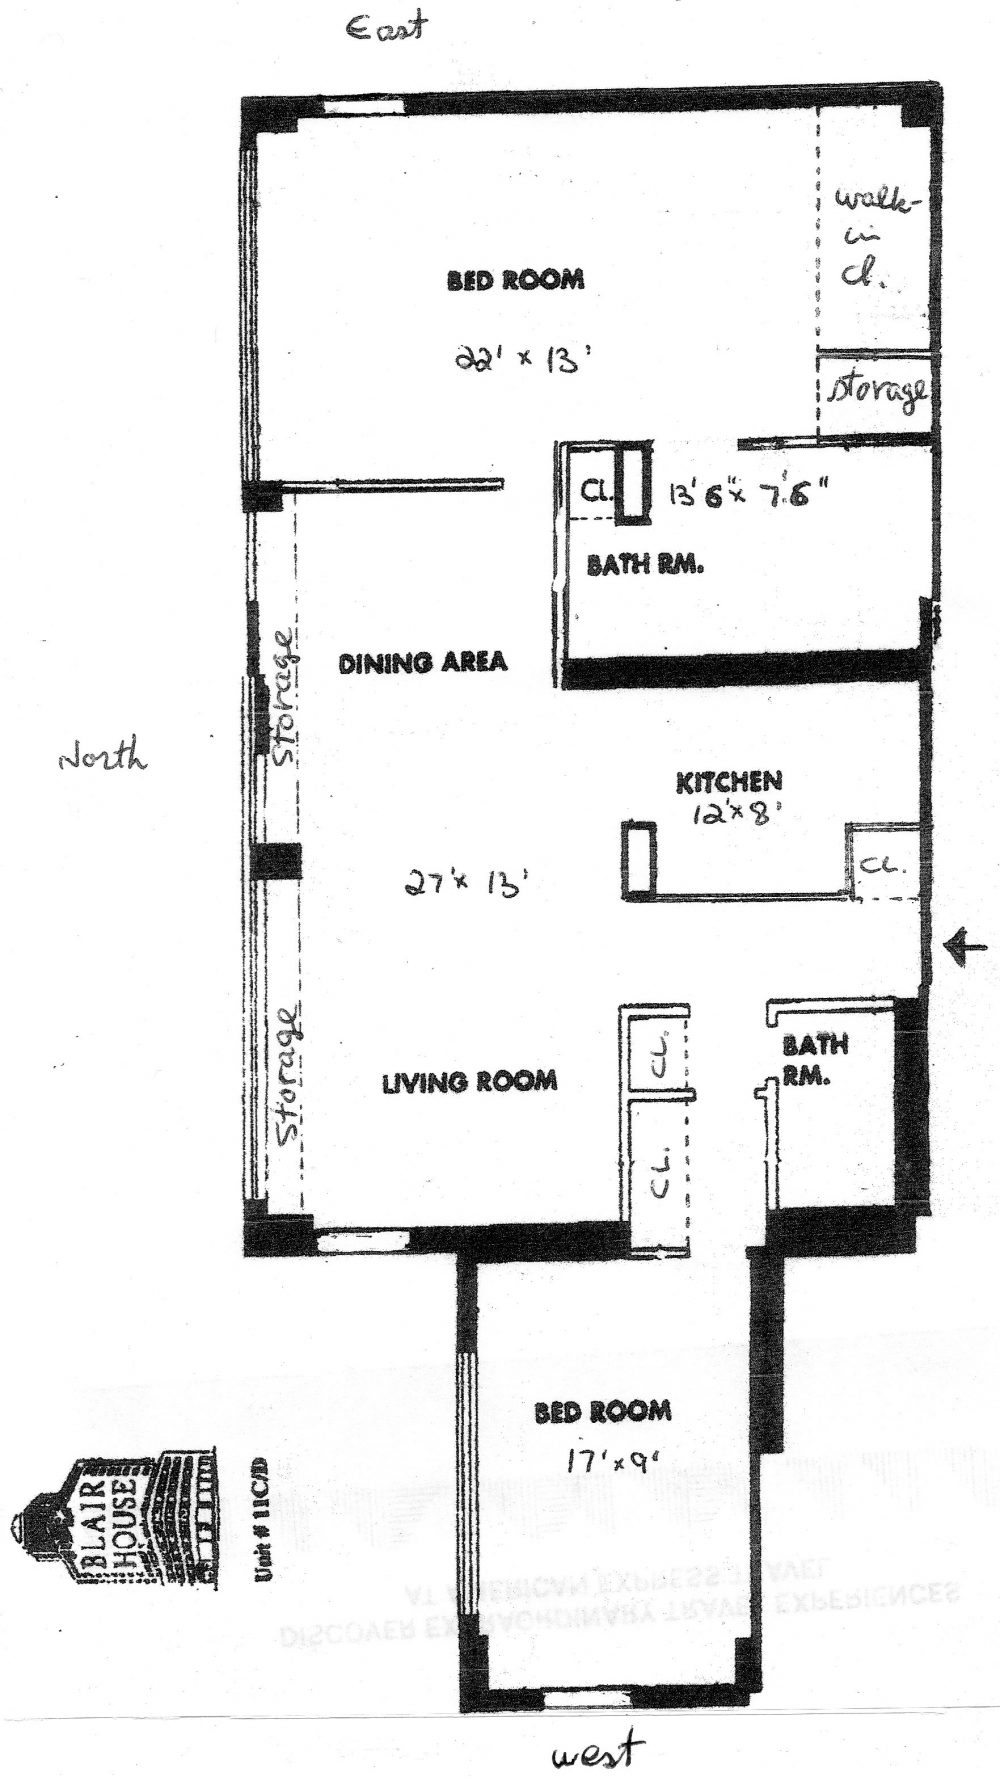 27970334nyc_floor_plan